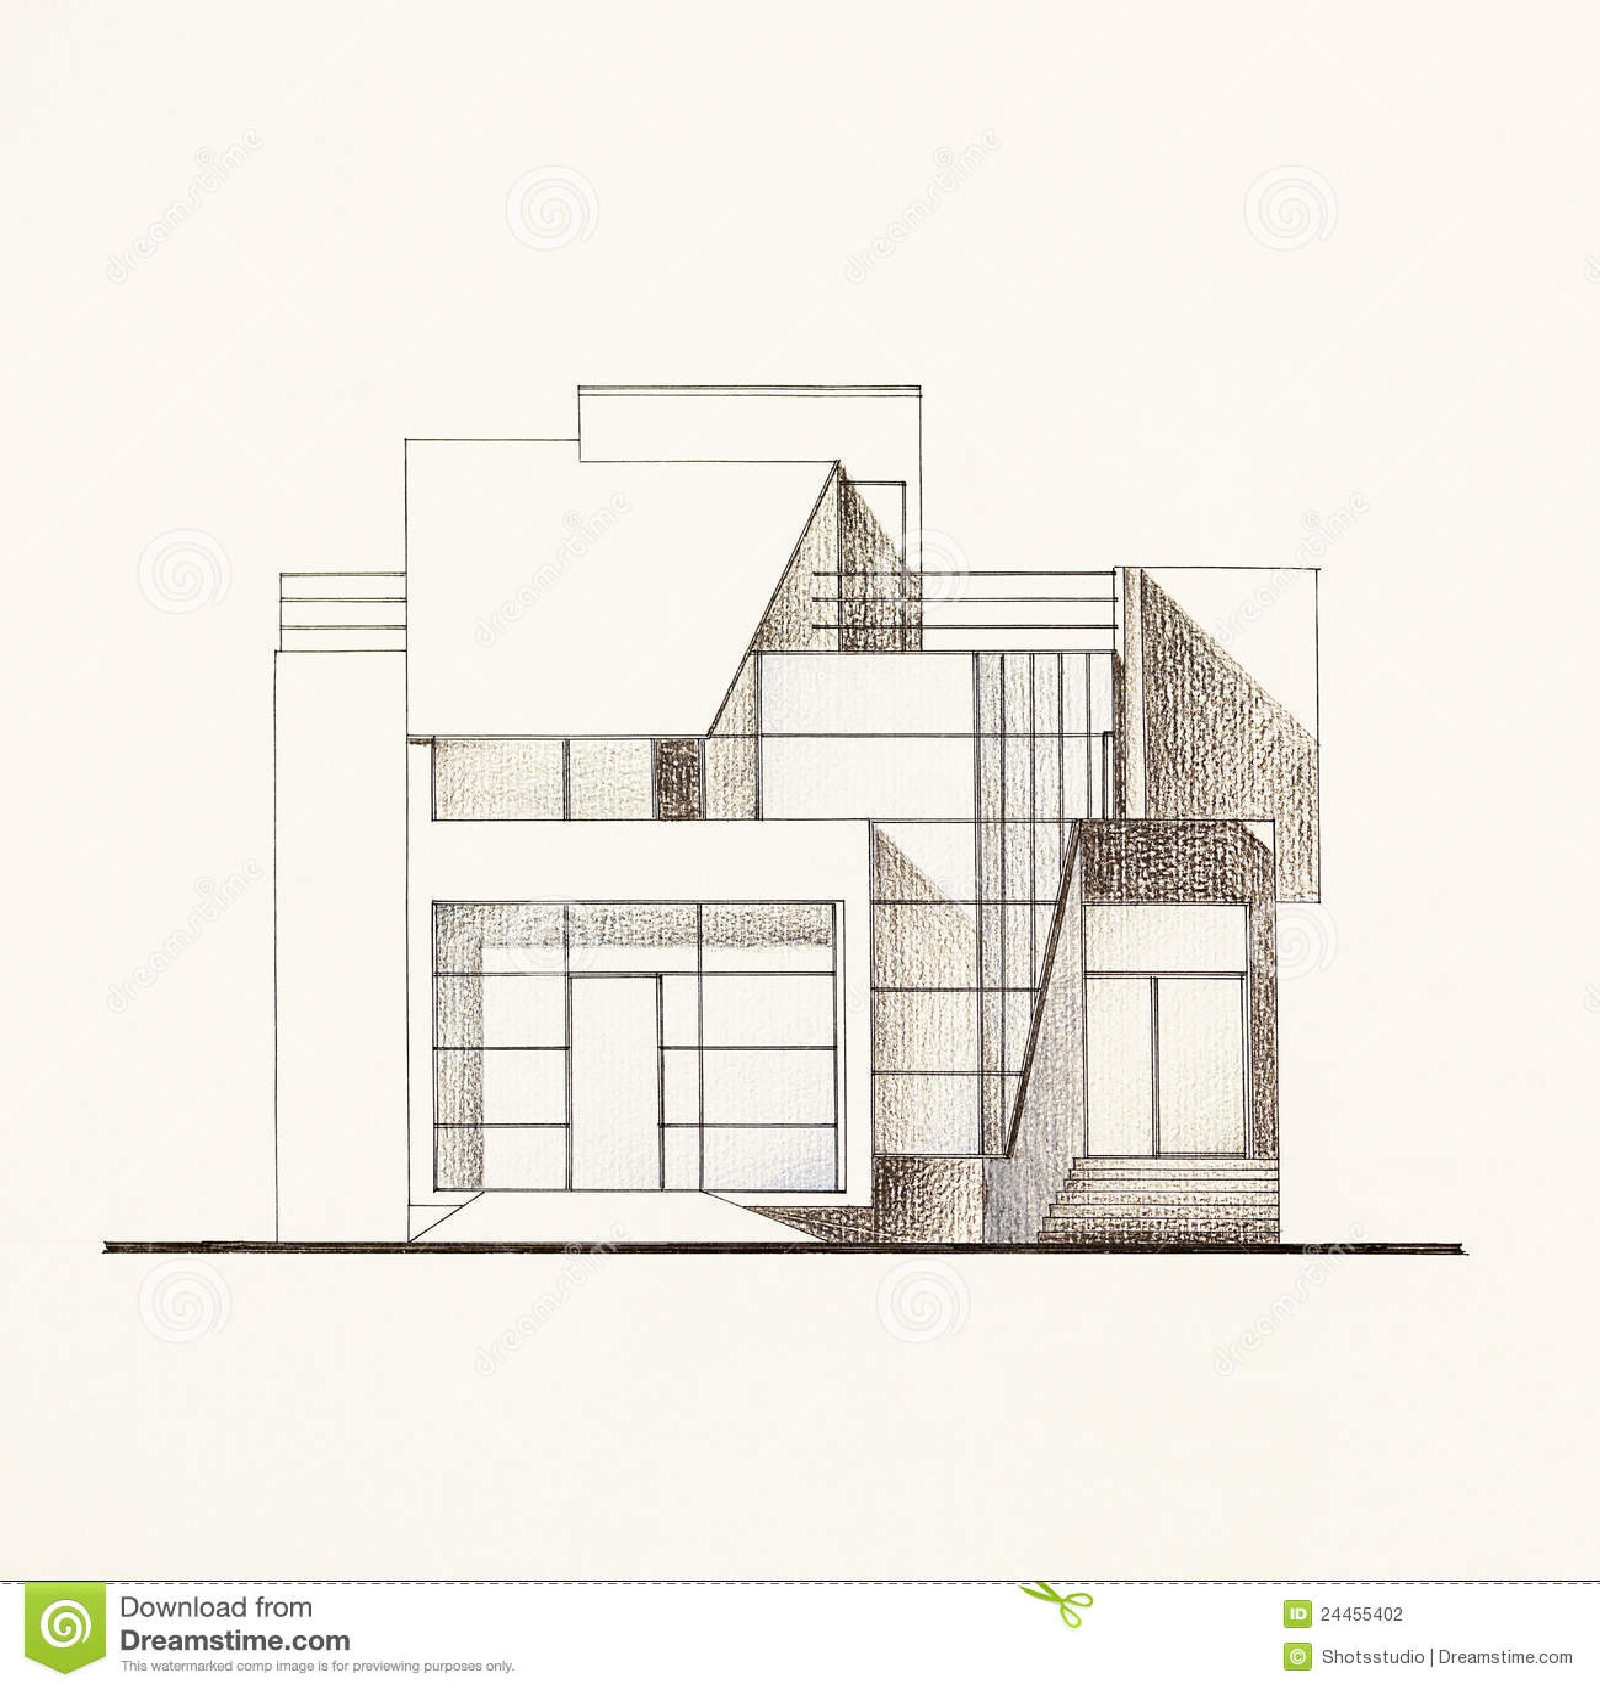 Modelo arquitect nico de la fachada de una casa moderna for Casa moderna autocad